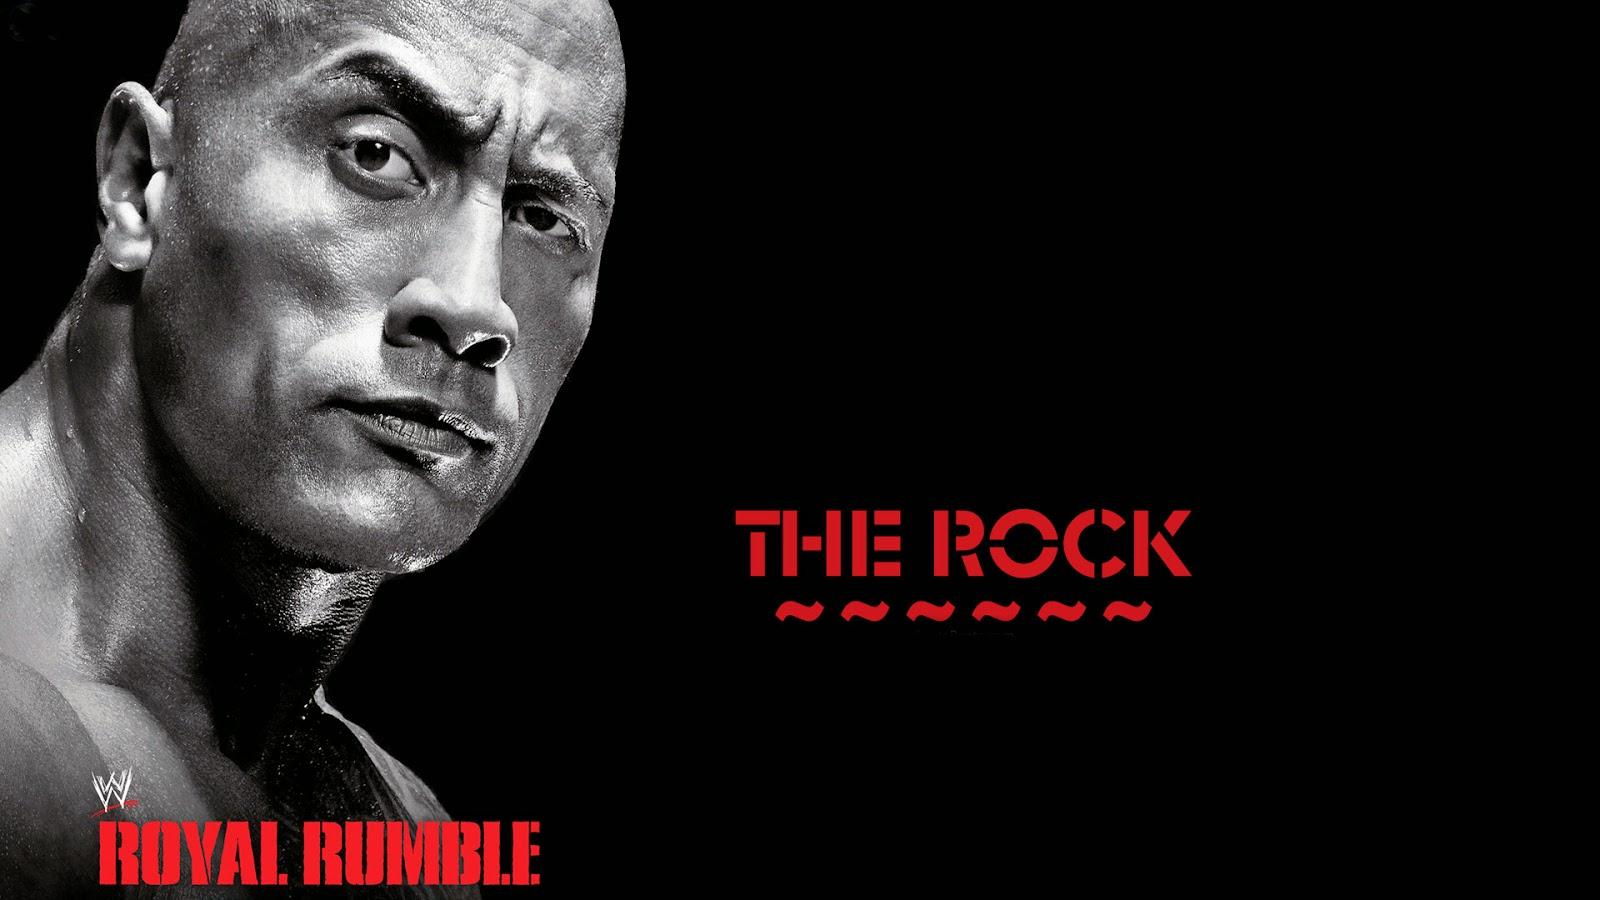 The Rock WWE Latest Beautiful HD Wallpaper 2014-15